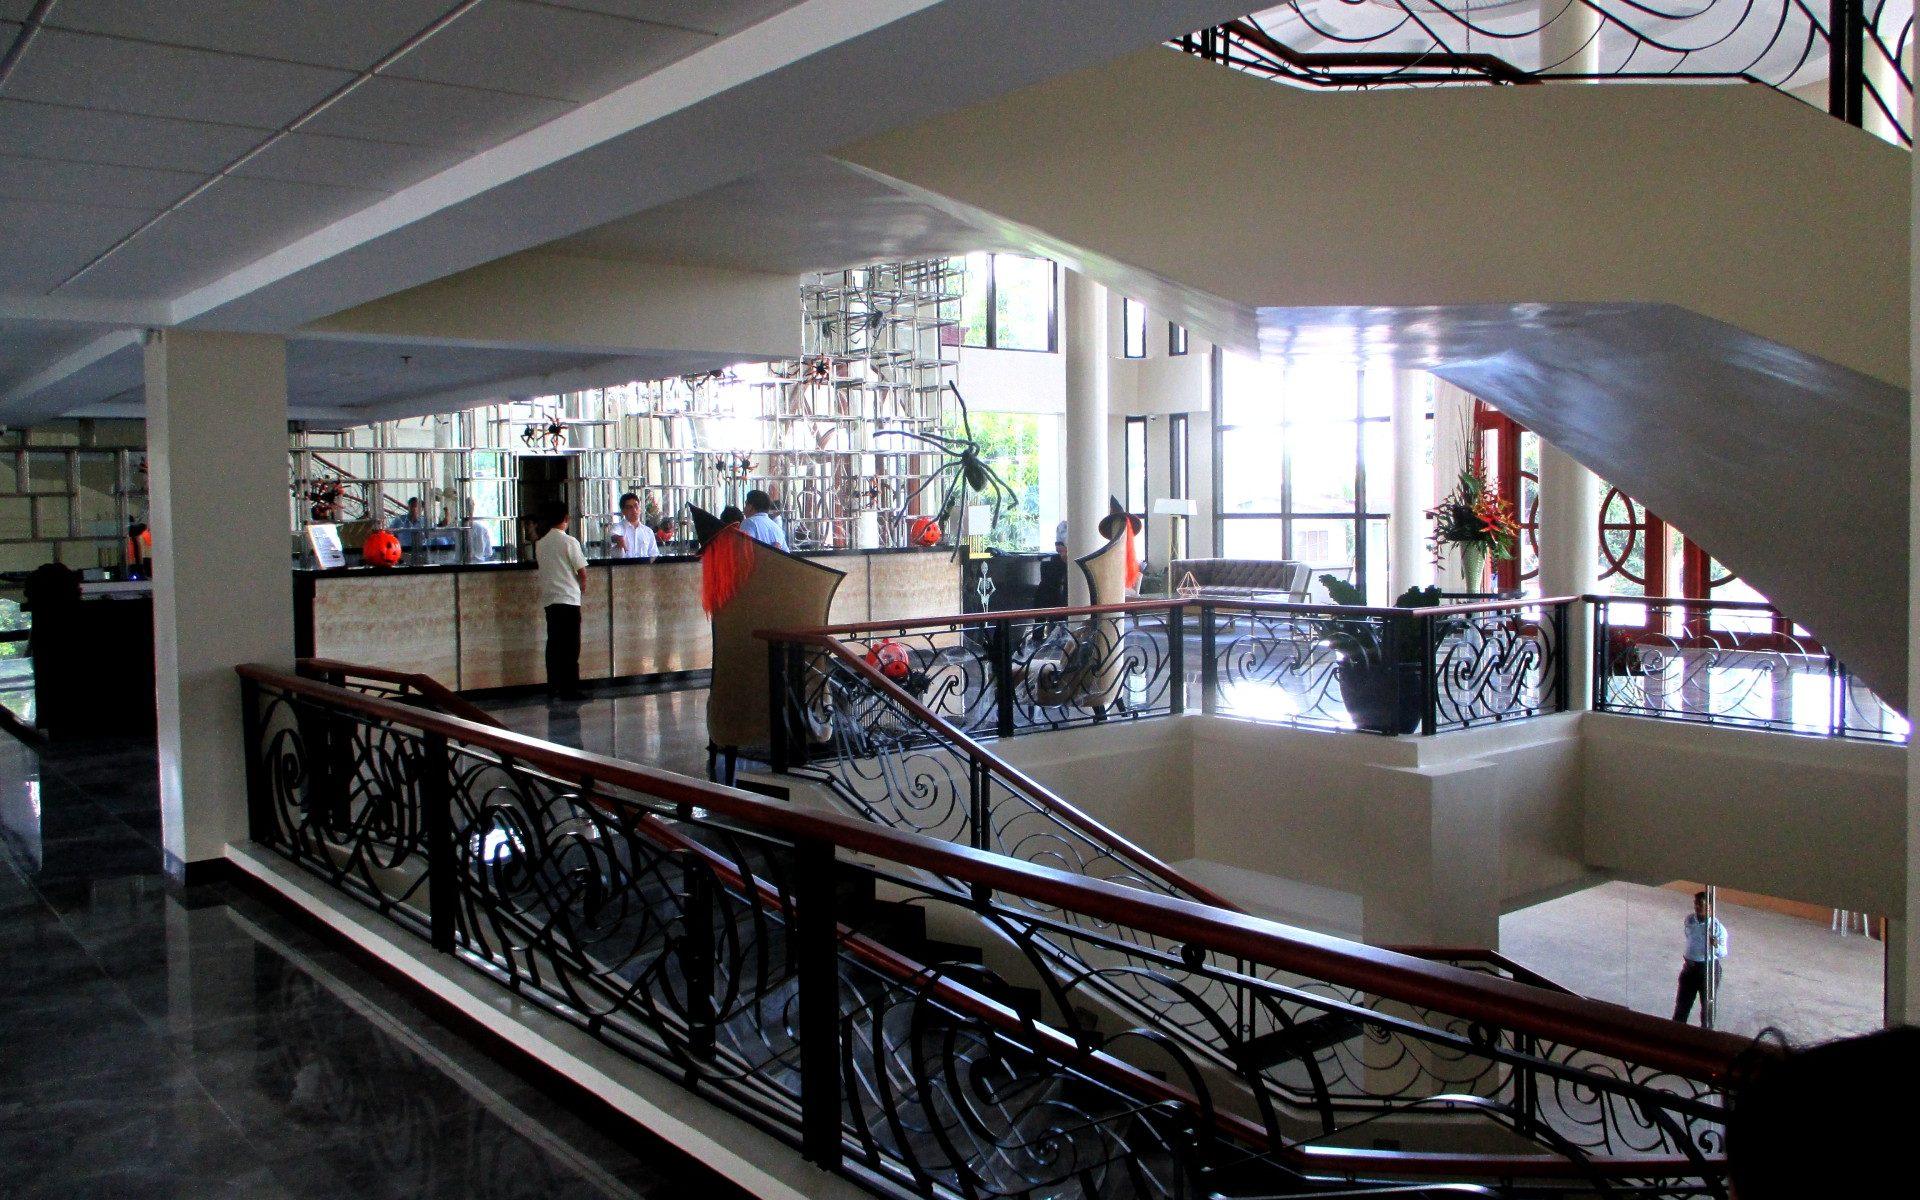 Hotel Oazis Lobby Butuan City Philippines